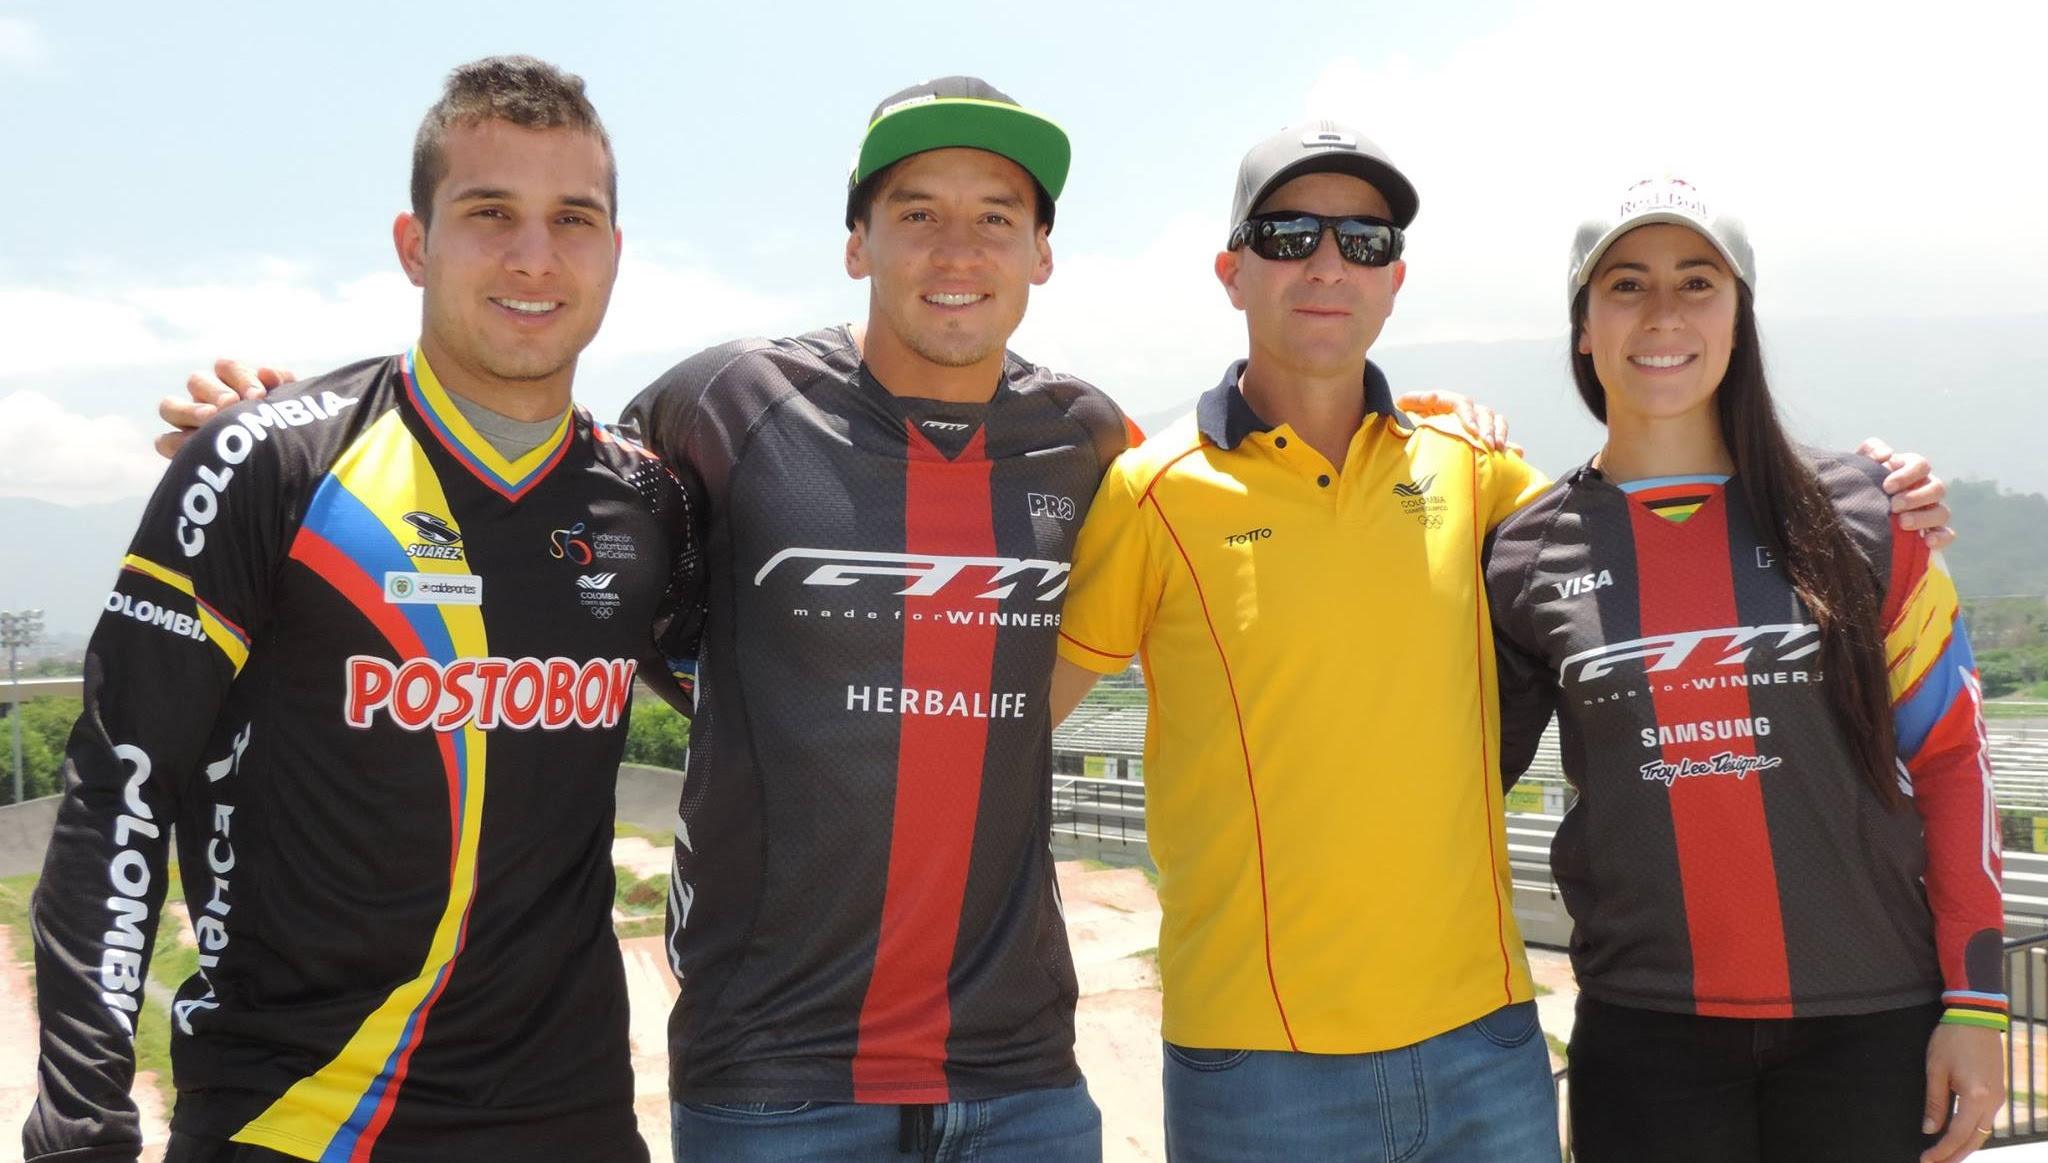 Copa Mundo BMX en Holanda